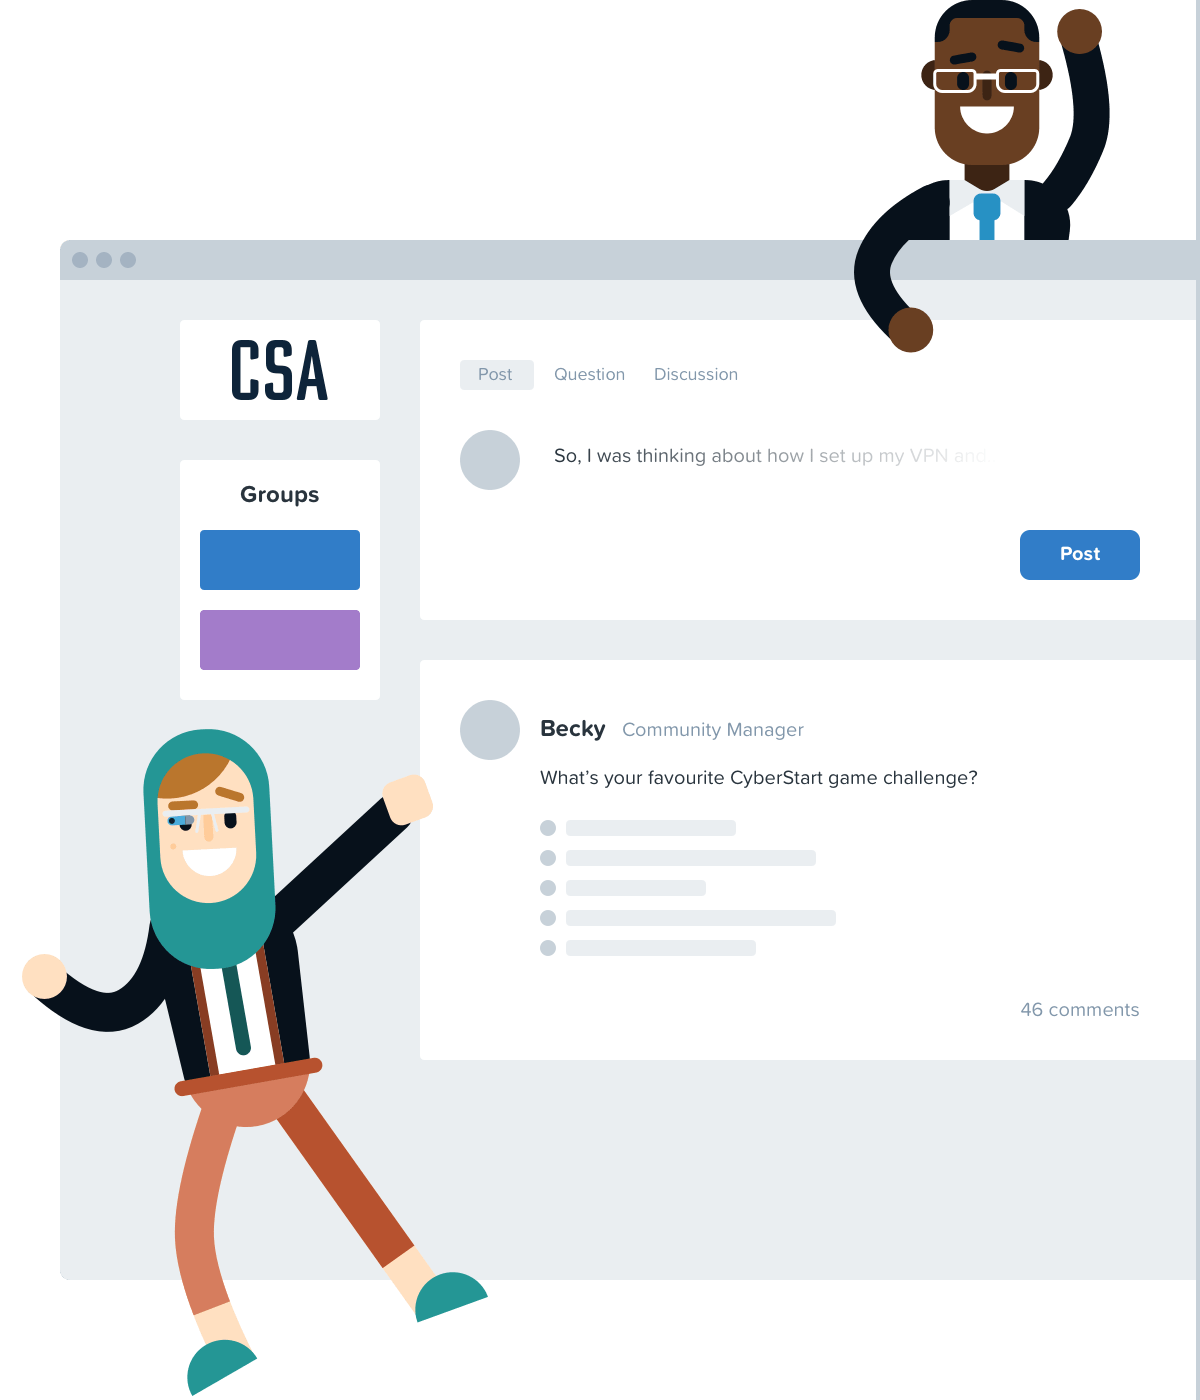 Illustrative image of the CyberStart America community platform